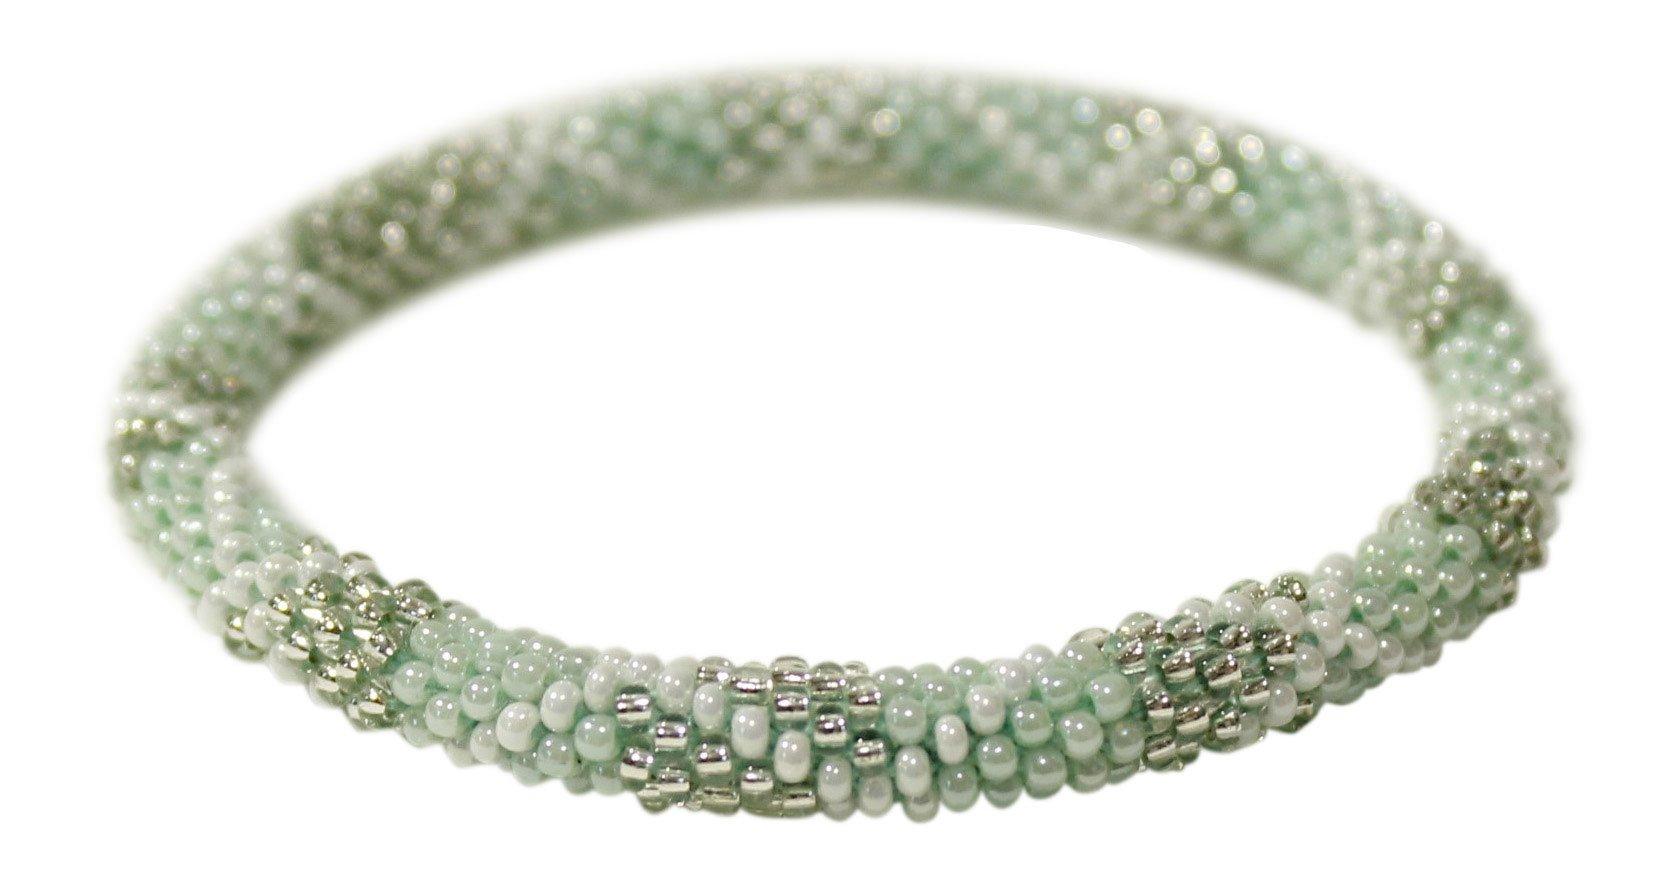 Aid Through Trade Beaded Roll-on Bracelet - Seafoam (Dk Seafoam)